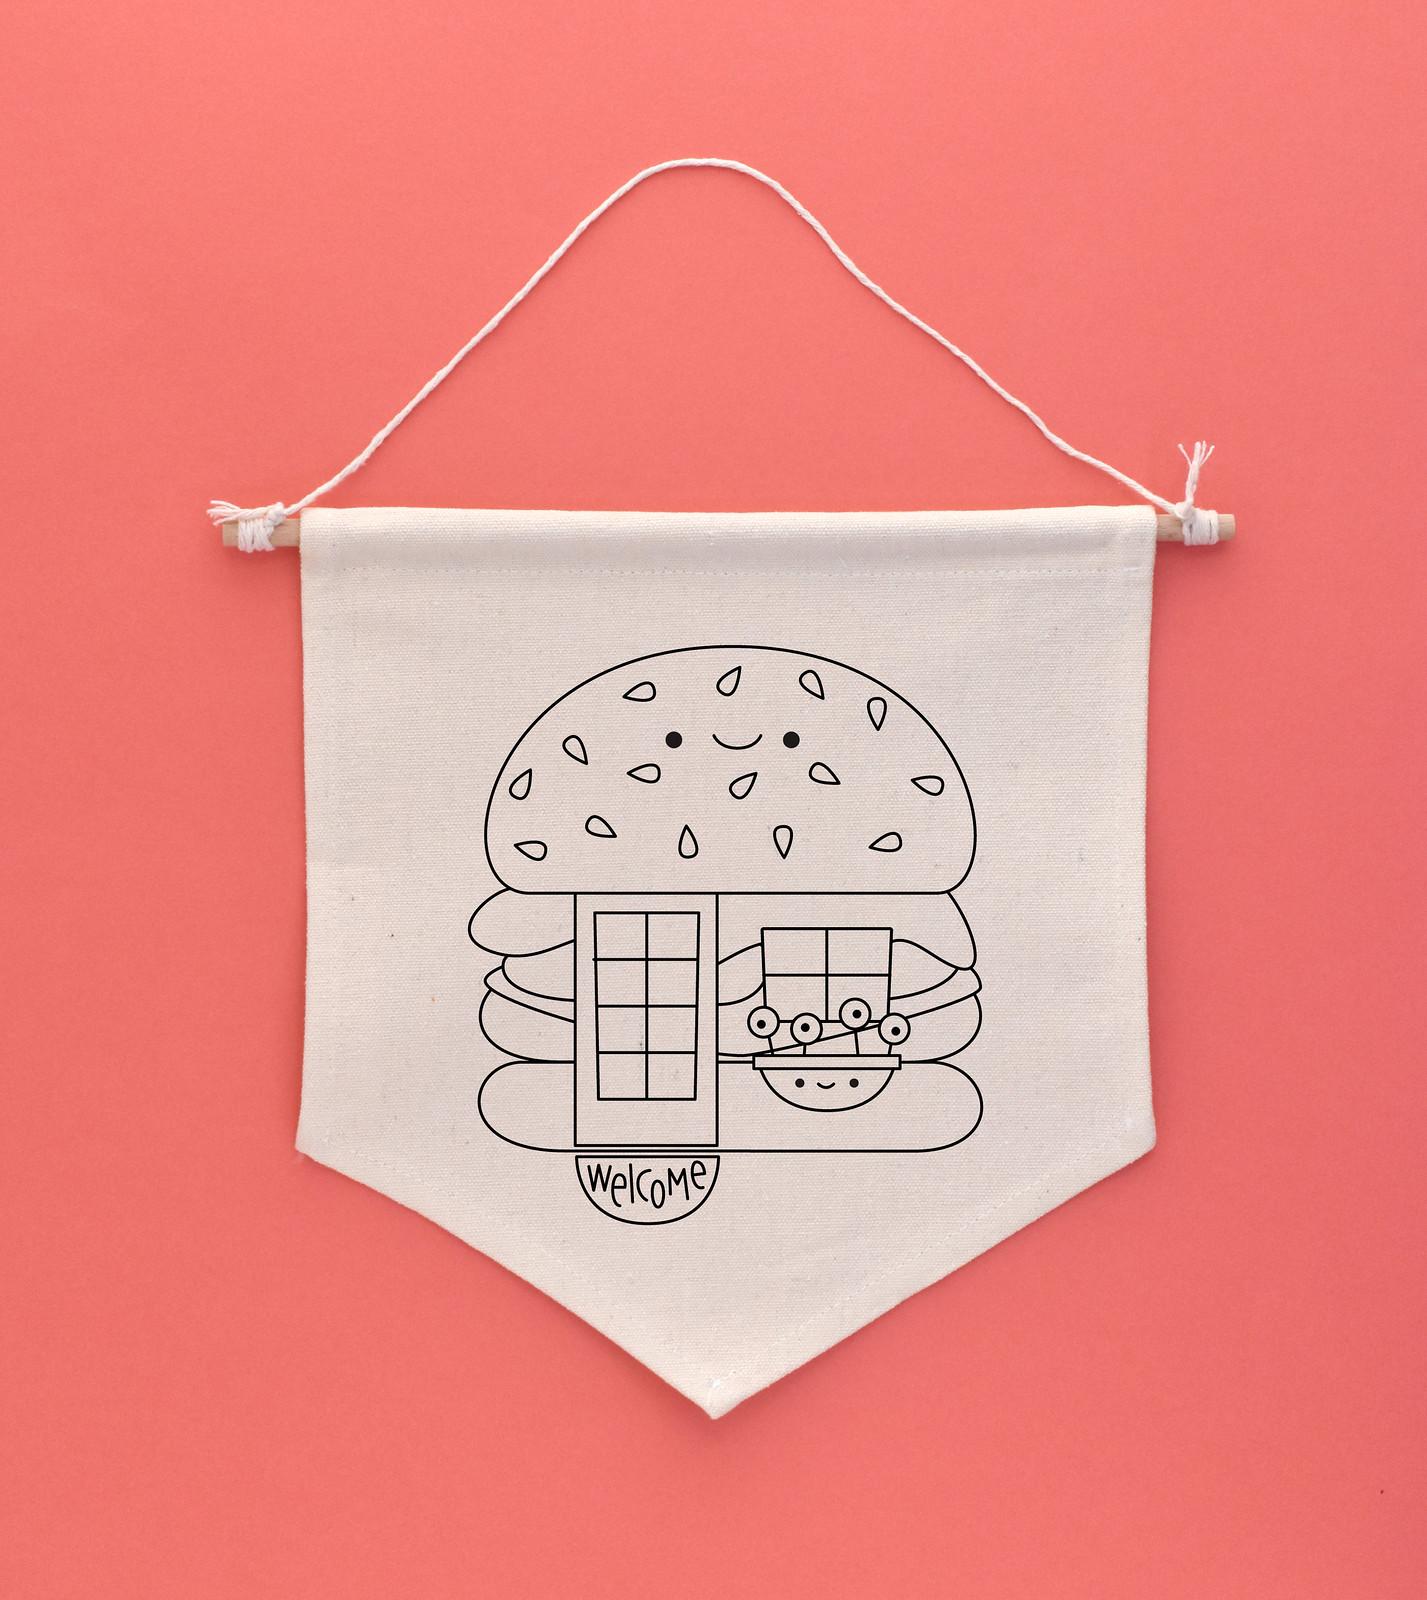 Kawaii Crossing Big Burger House Embroidery Pattern